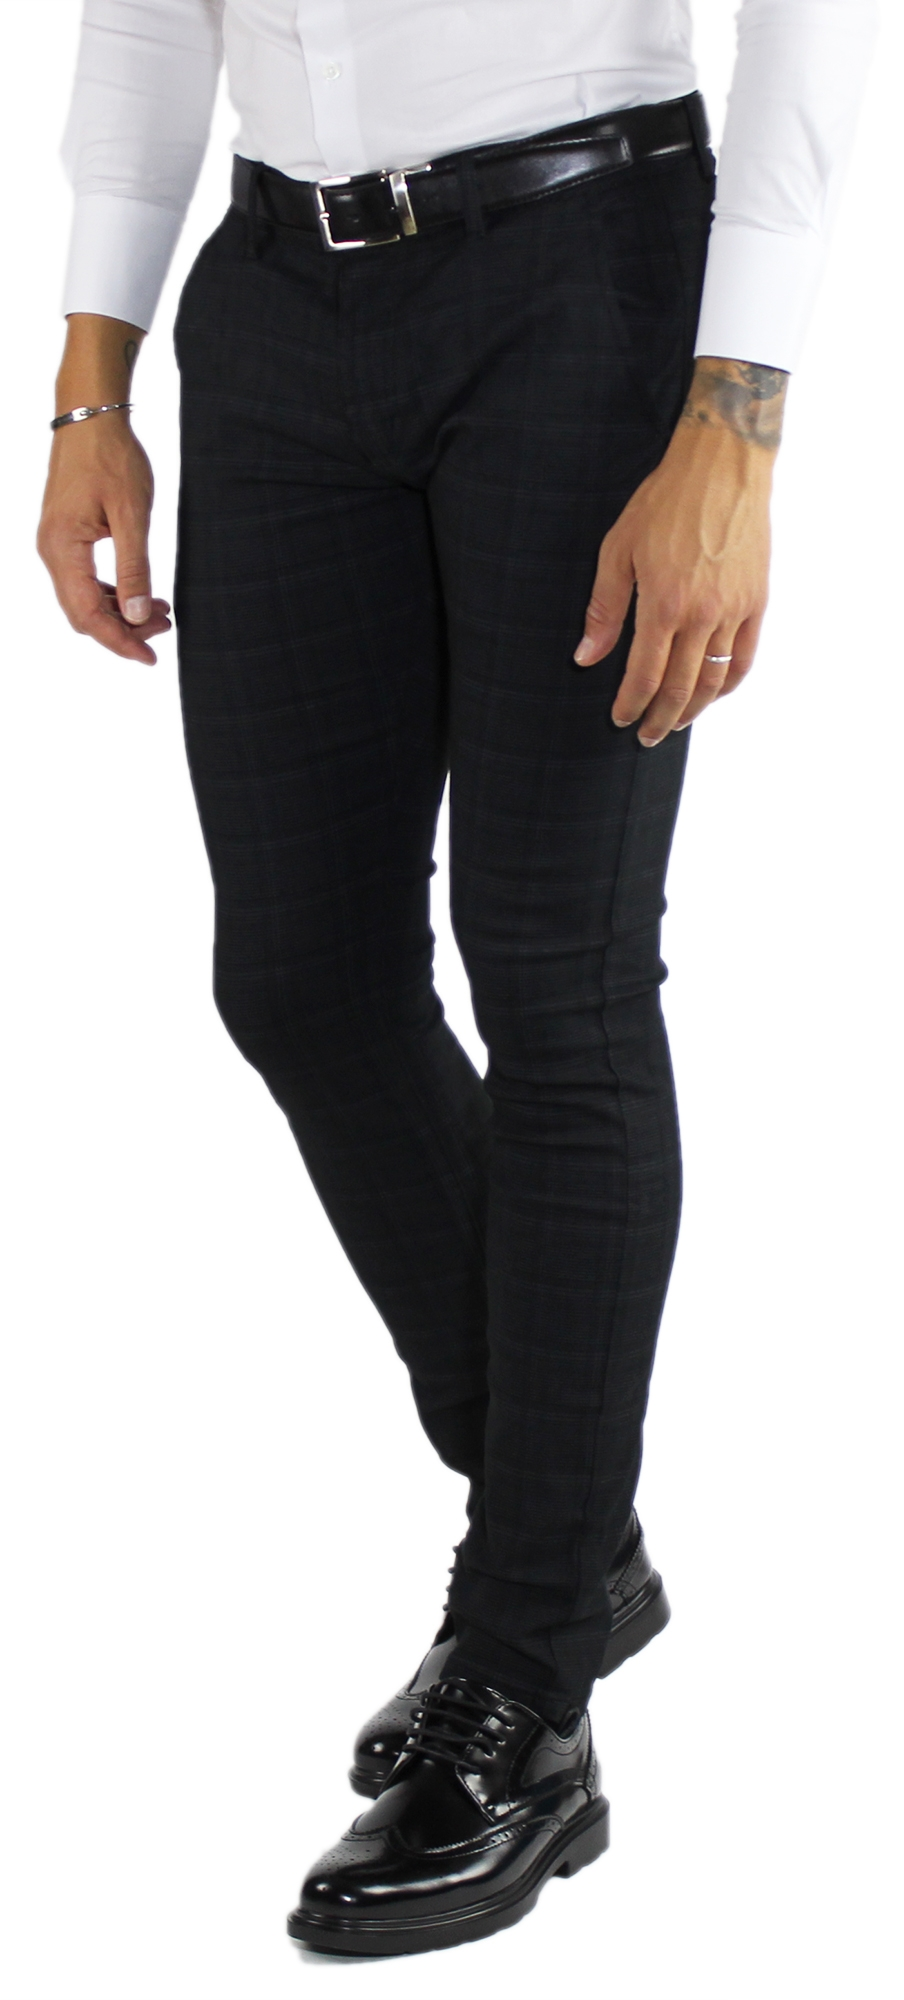 Pantaloni-Uomo-Invernali-a-Quadri-Eleganti-Pantalone-Slim-Fit-Elasticizzati-Scoz miniatura 10